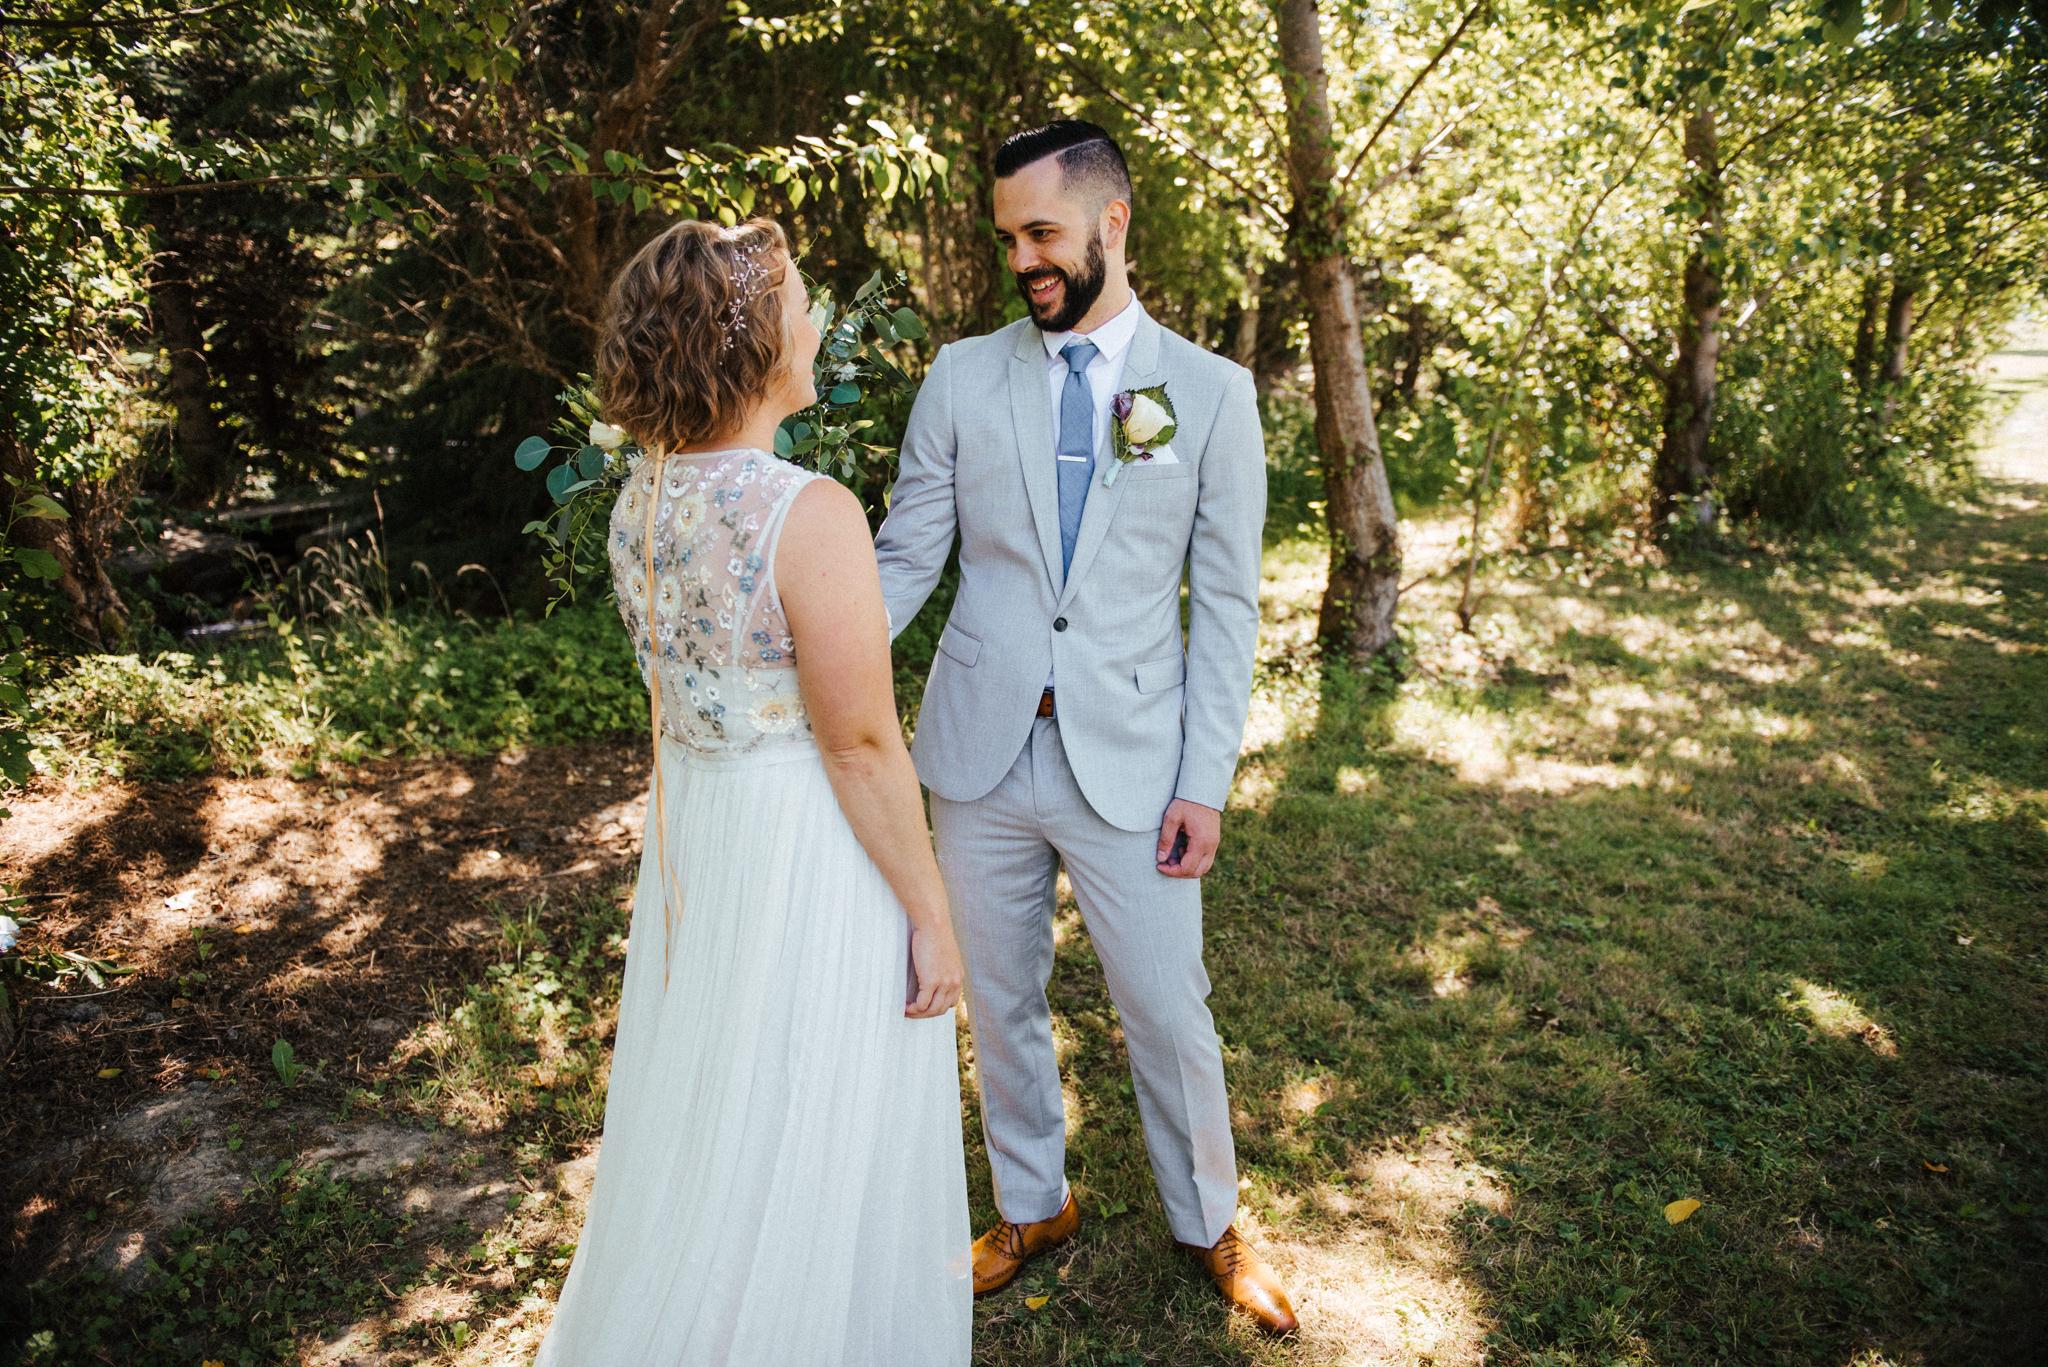 Amy Steven Seattle Wedding Photographer Vishal Goklani_022.jpg